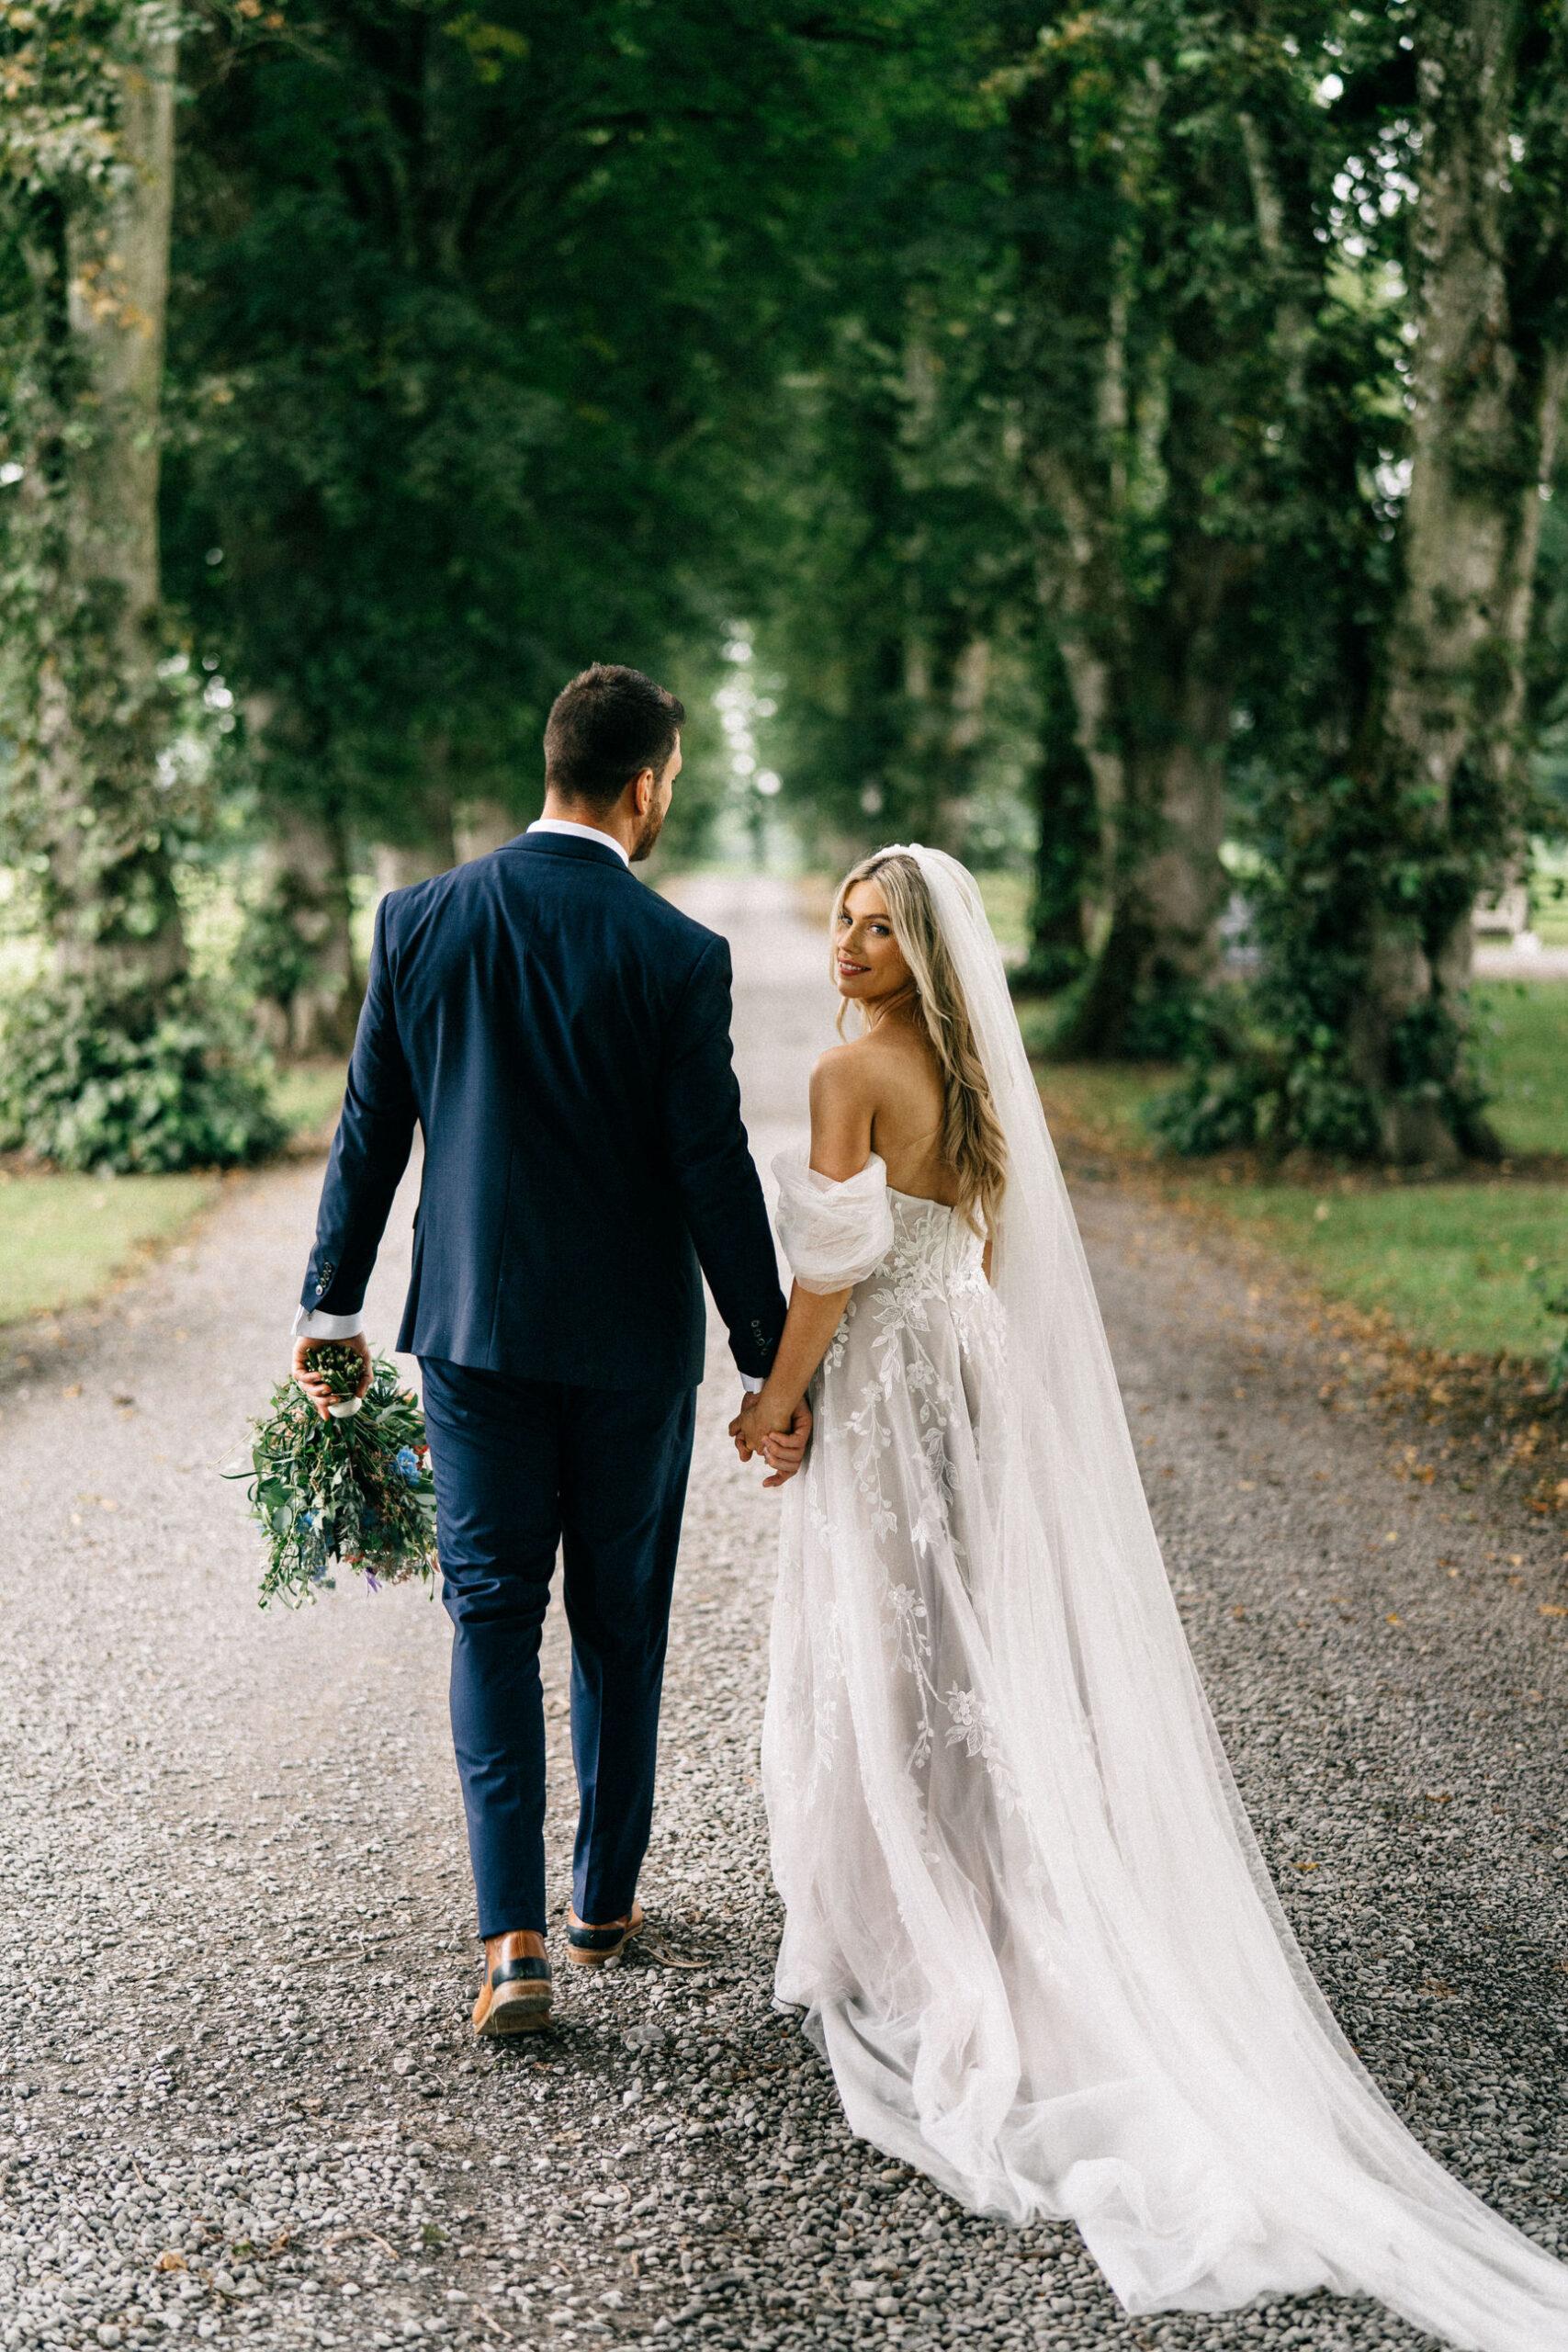 wedding photography Ireland 3 16